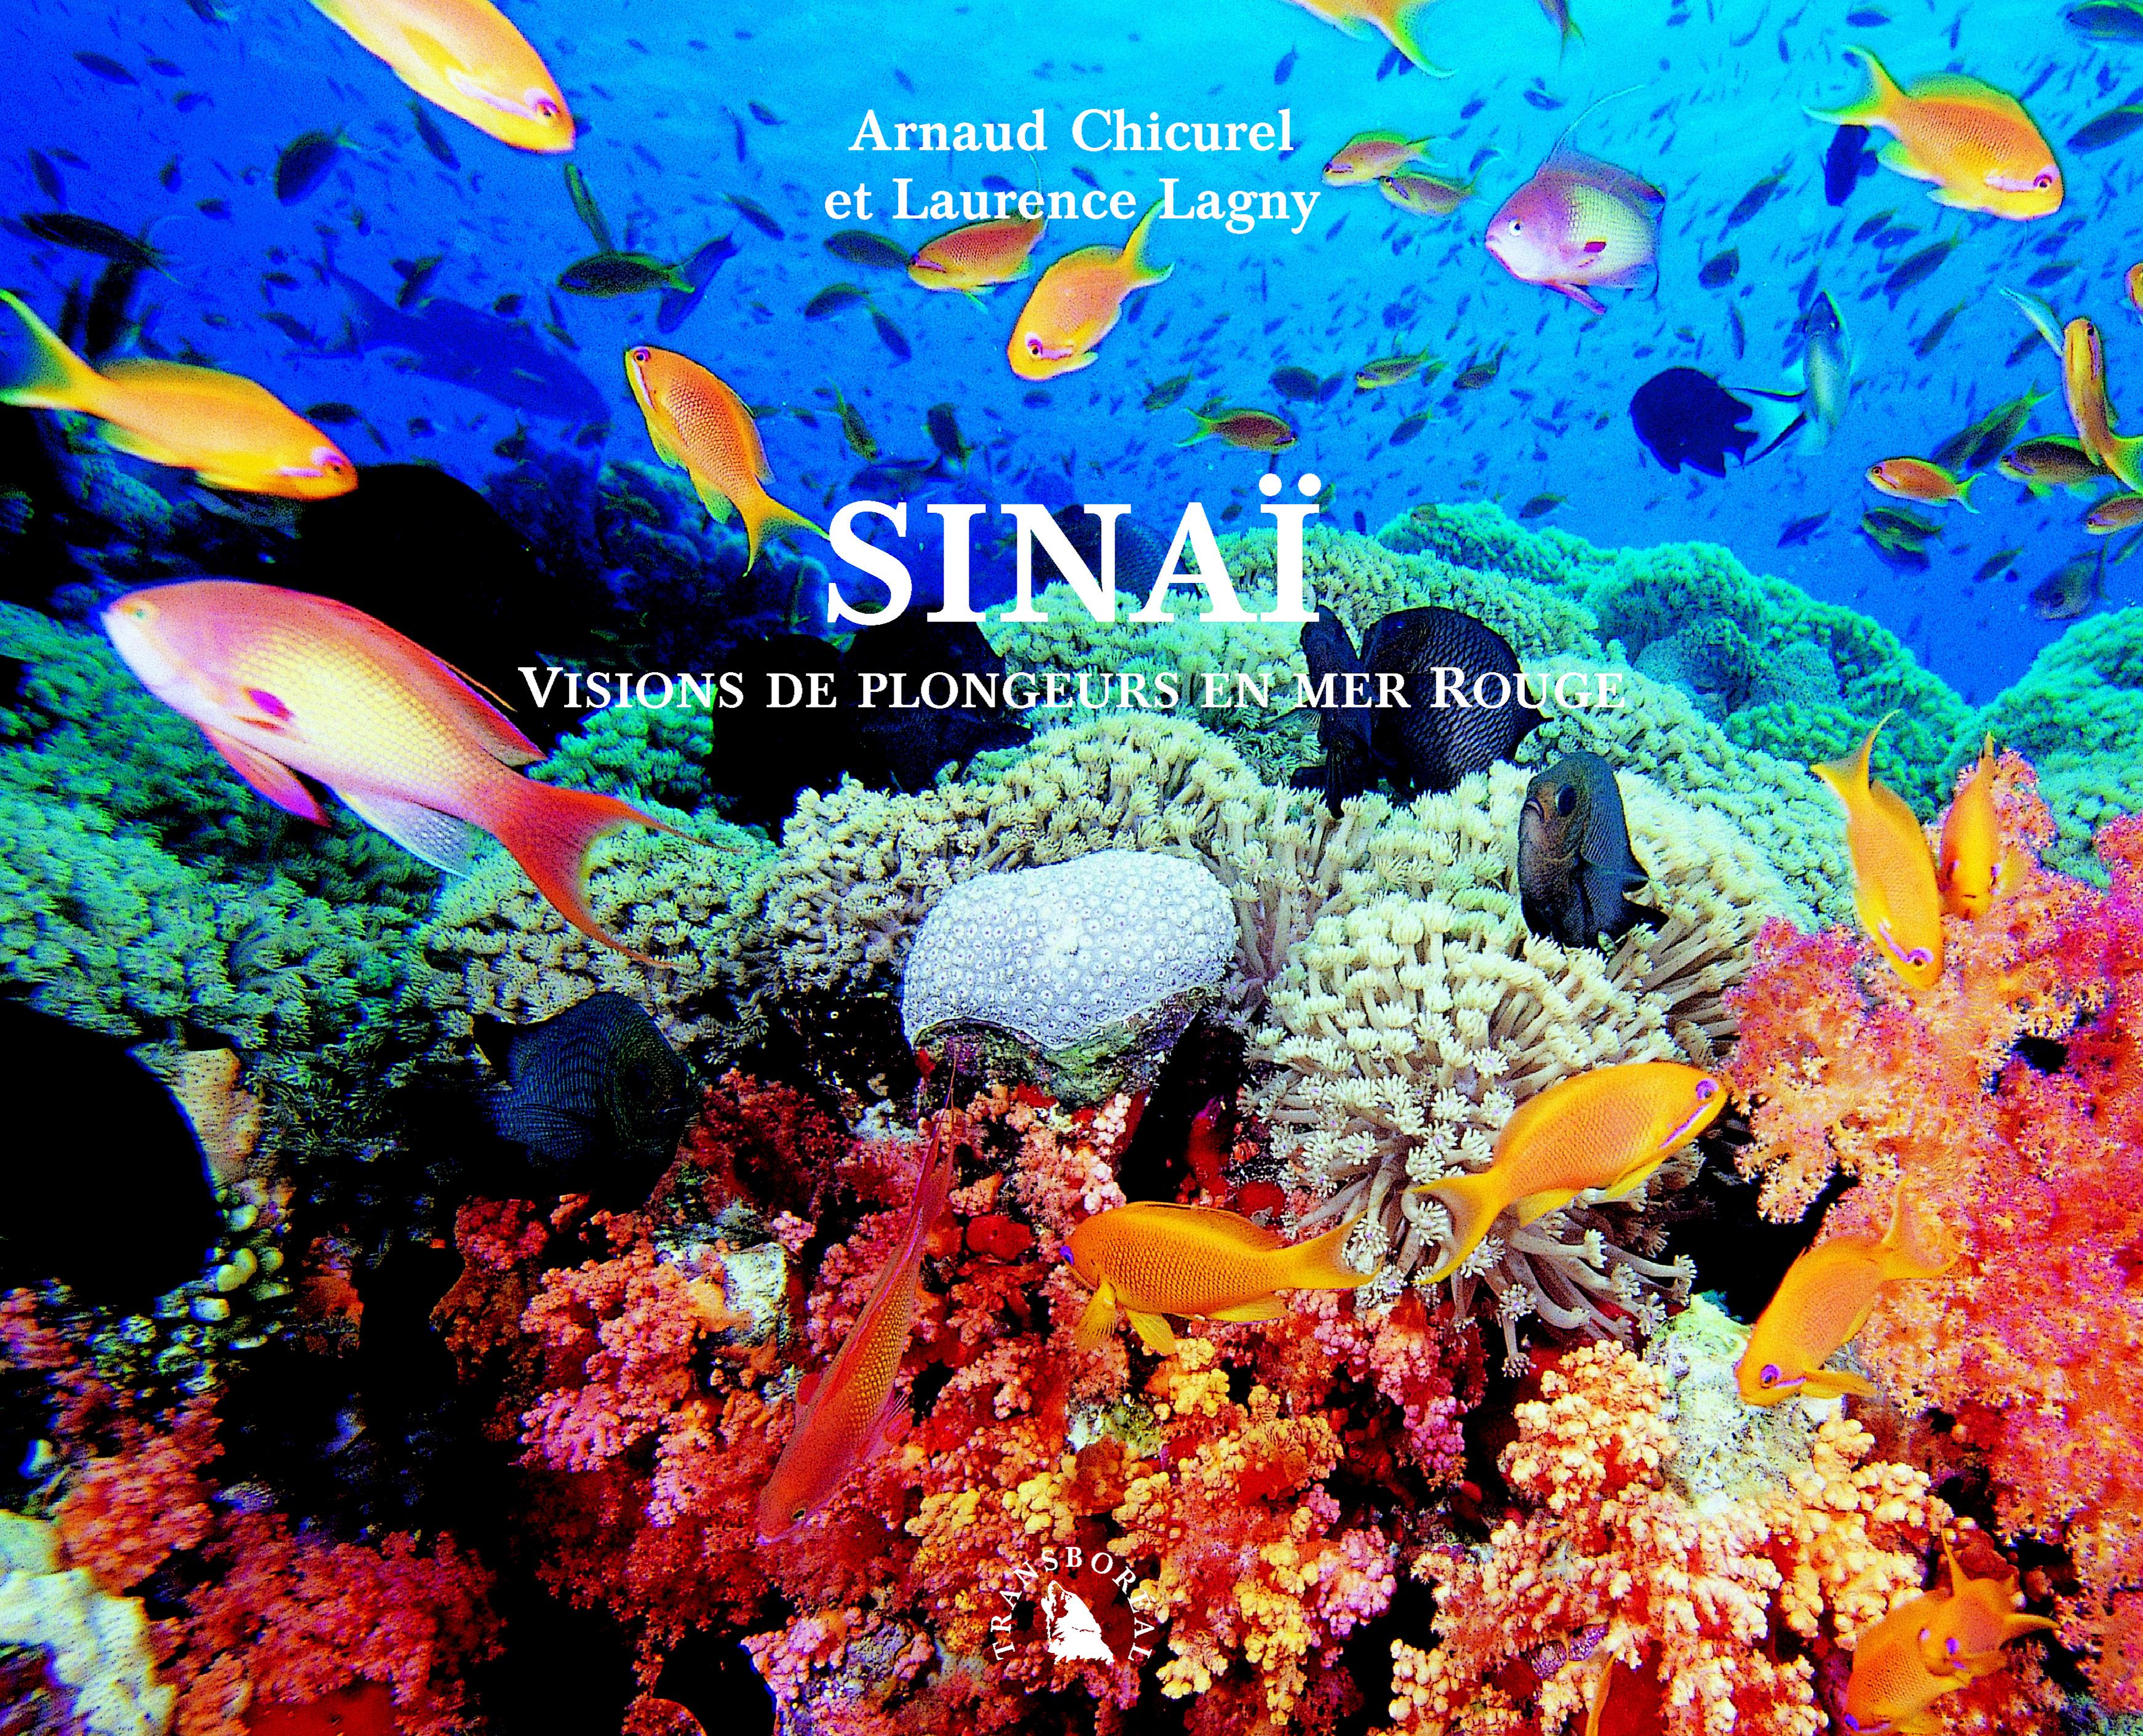 SINAI. VISIONS DE PLONGEURS EN MER ROUGE